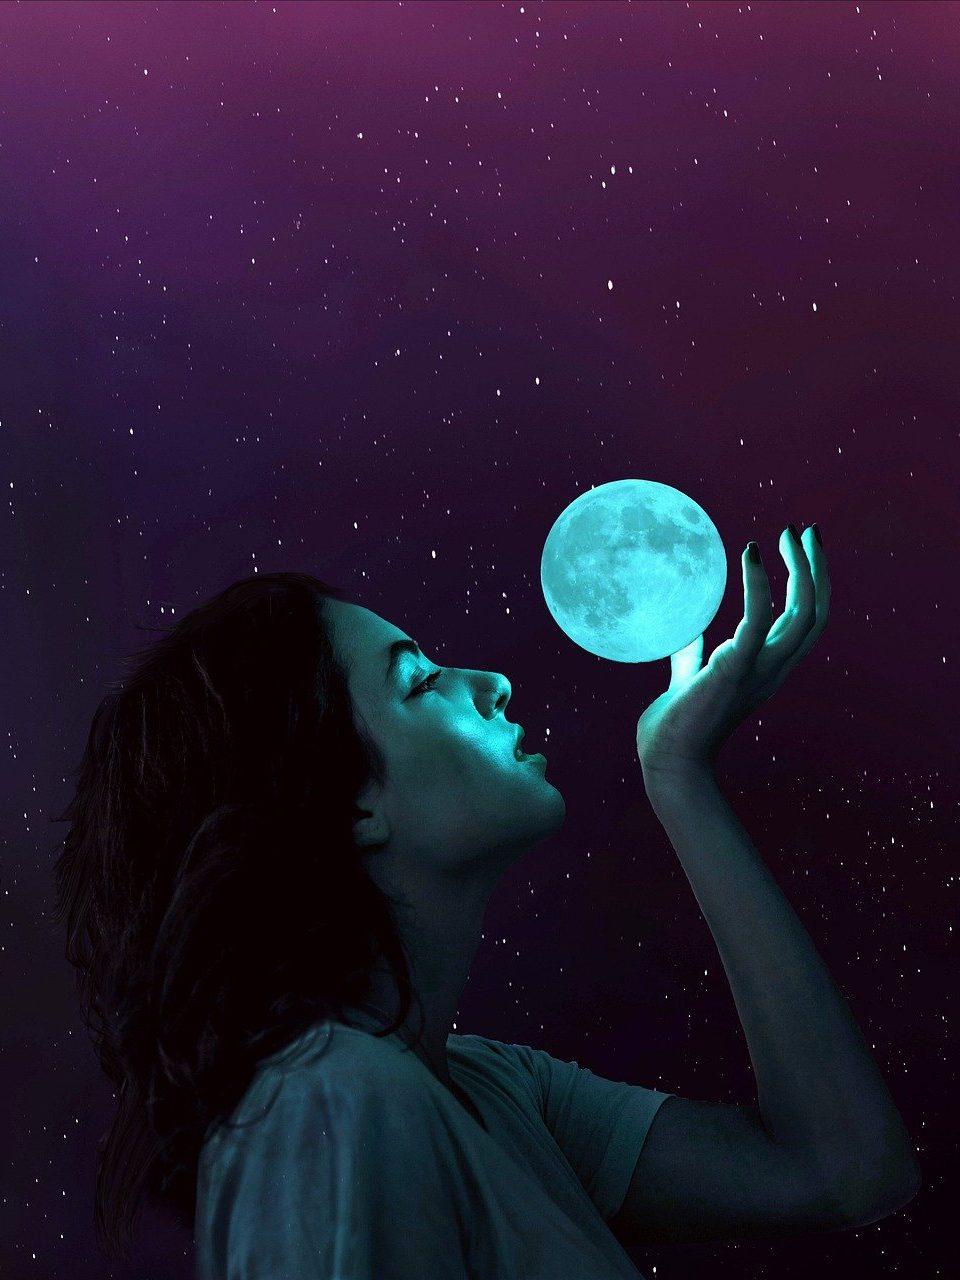 https://astroluna.rs/wp-content/uploads/2020/12/girl-5760295_1280-960x1280.jpg